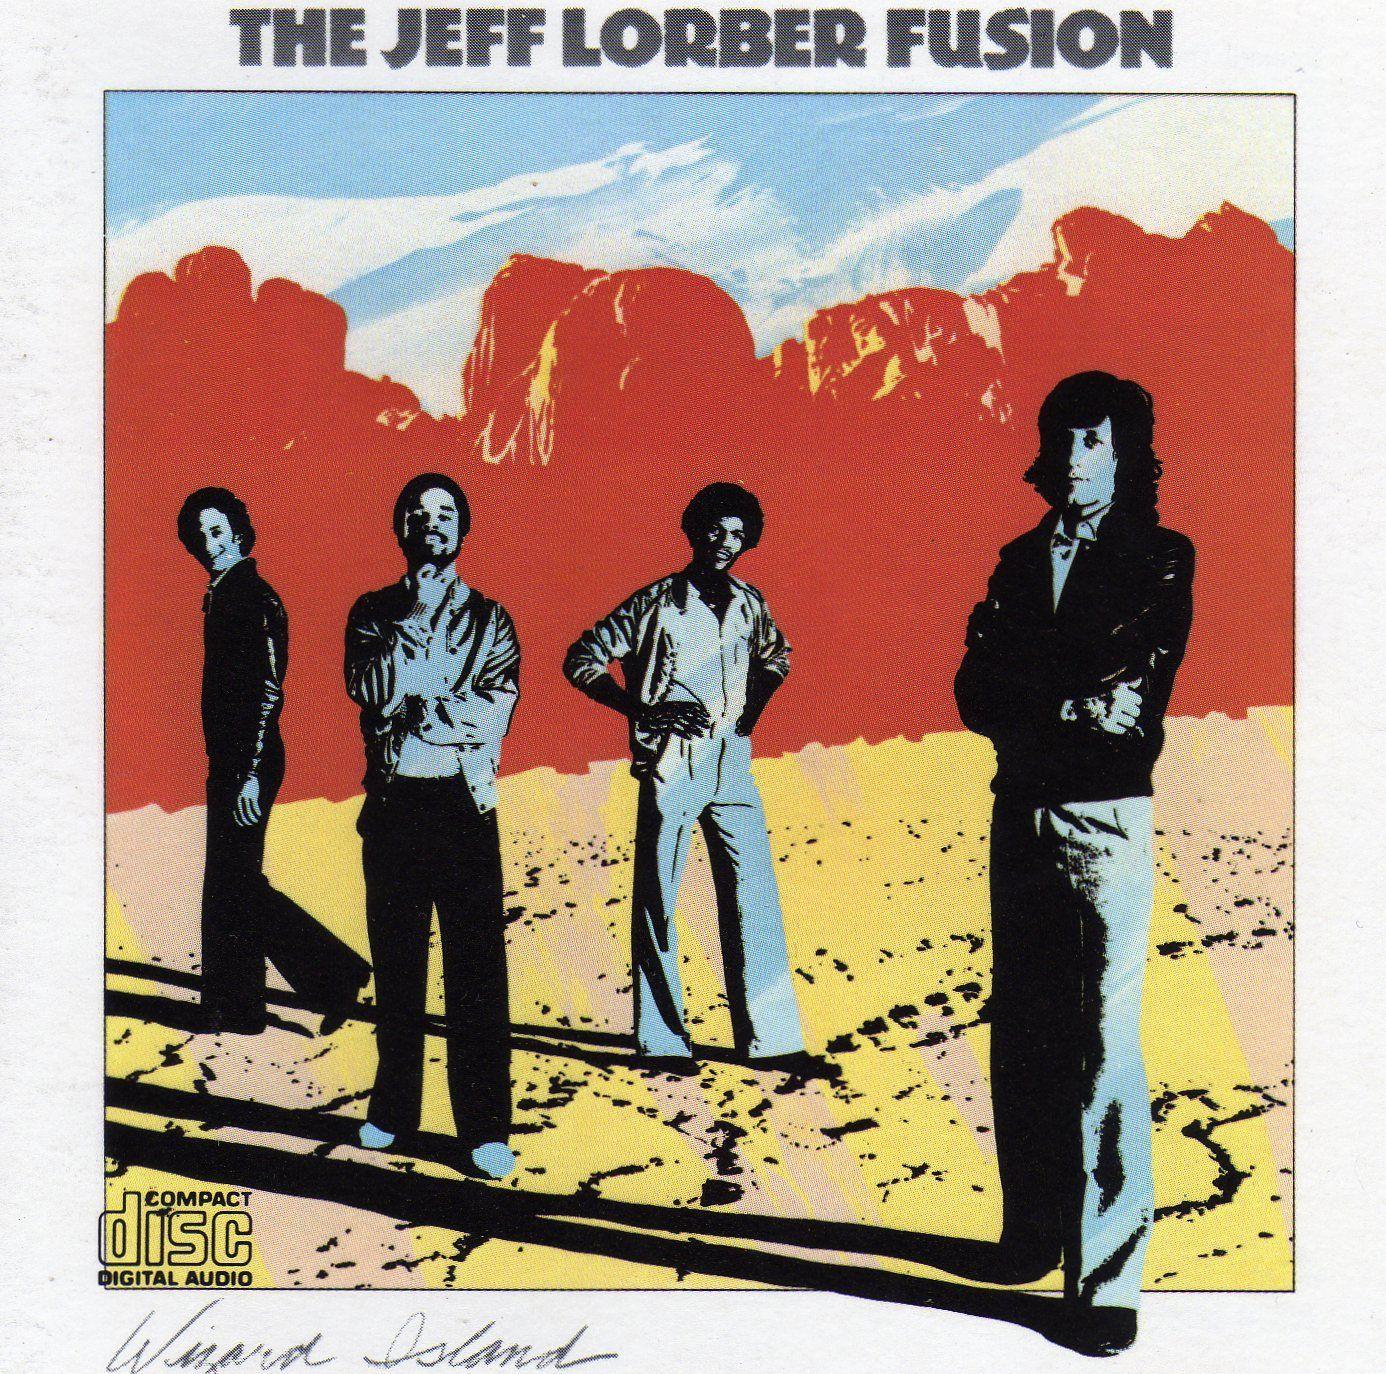 The Jeff Lorber Fusion HD wallpapers, Desktop wallpaper - most viewed